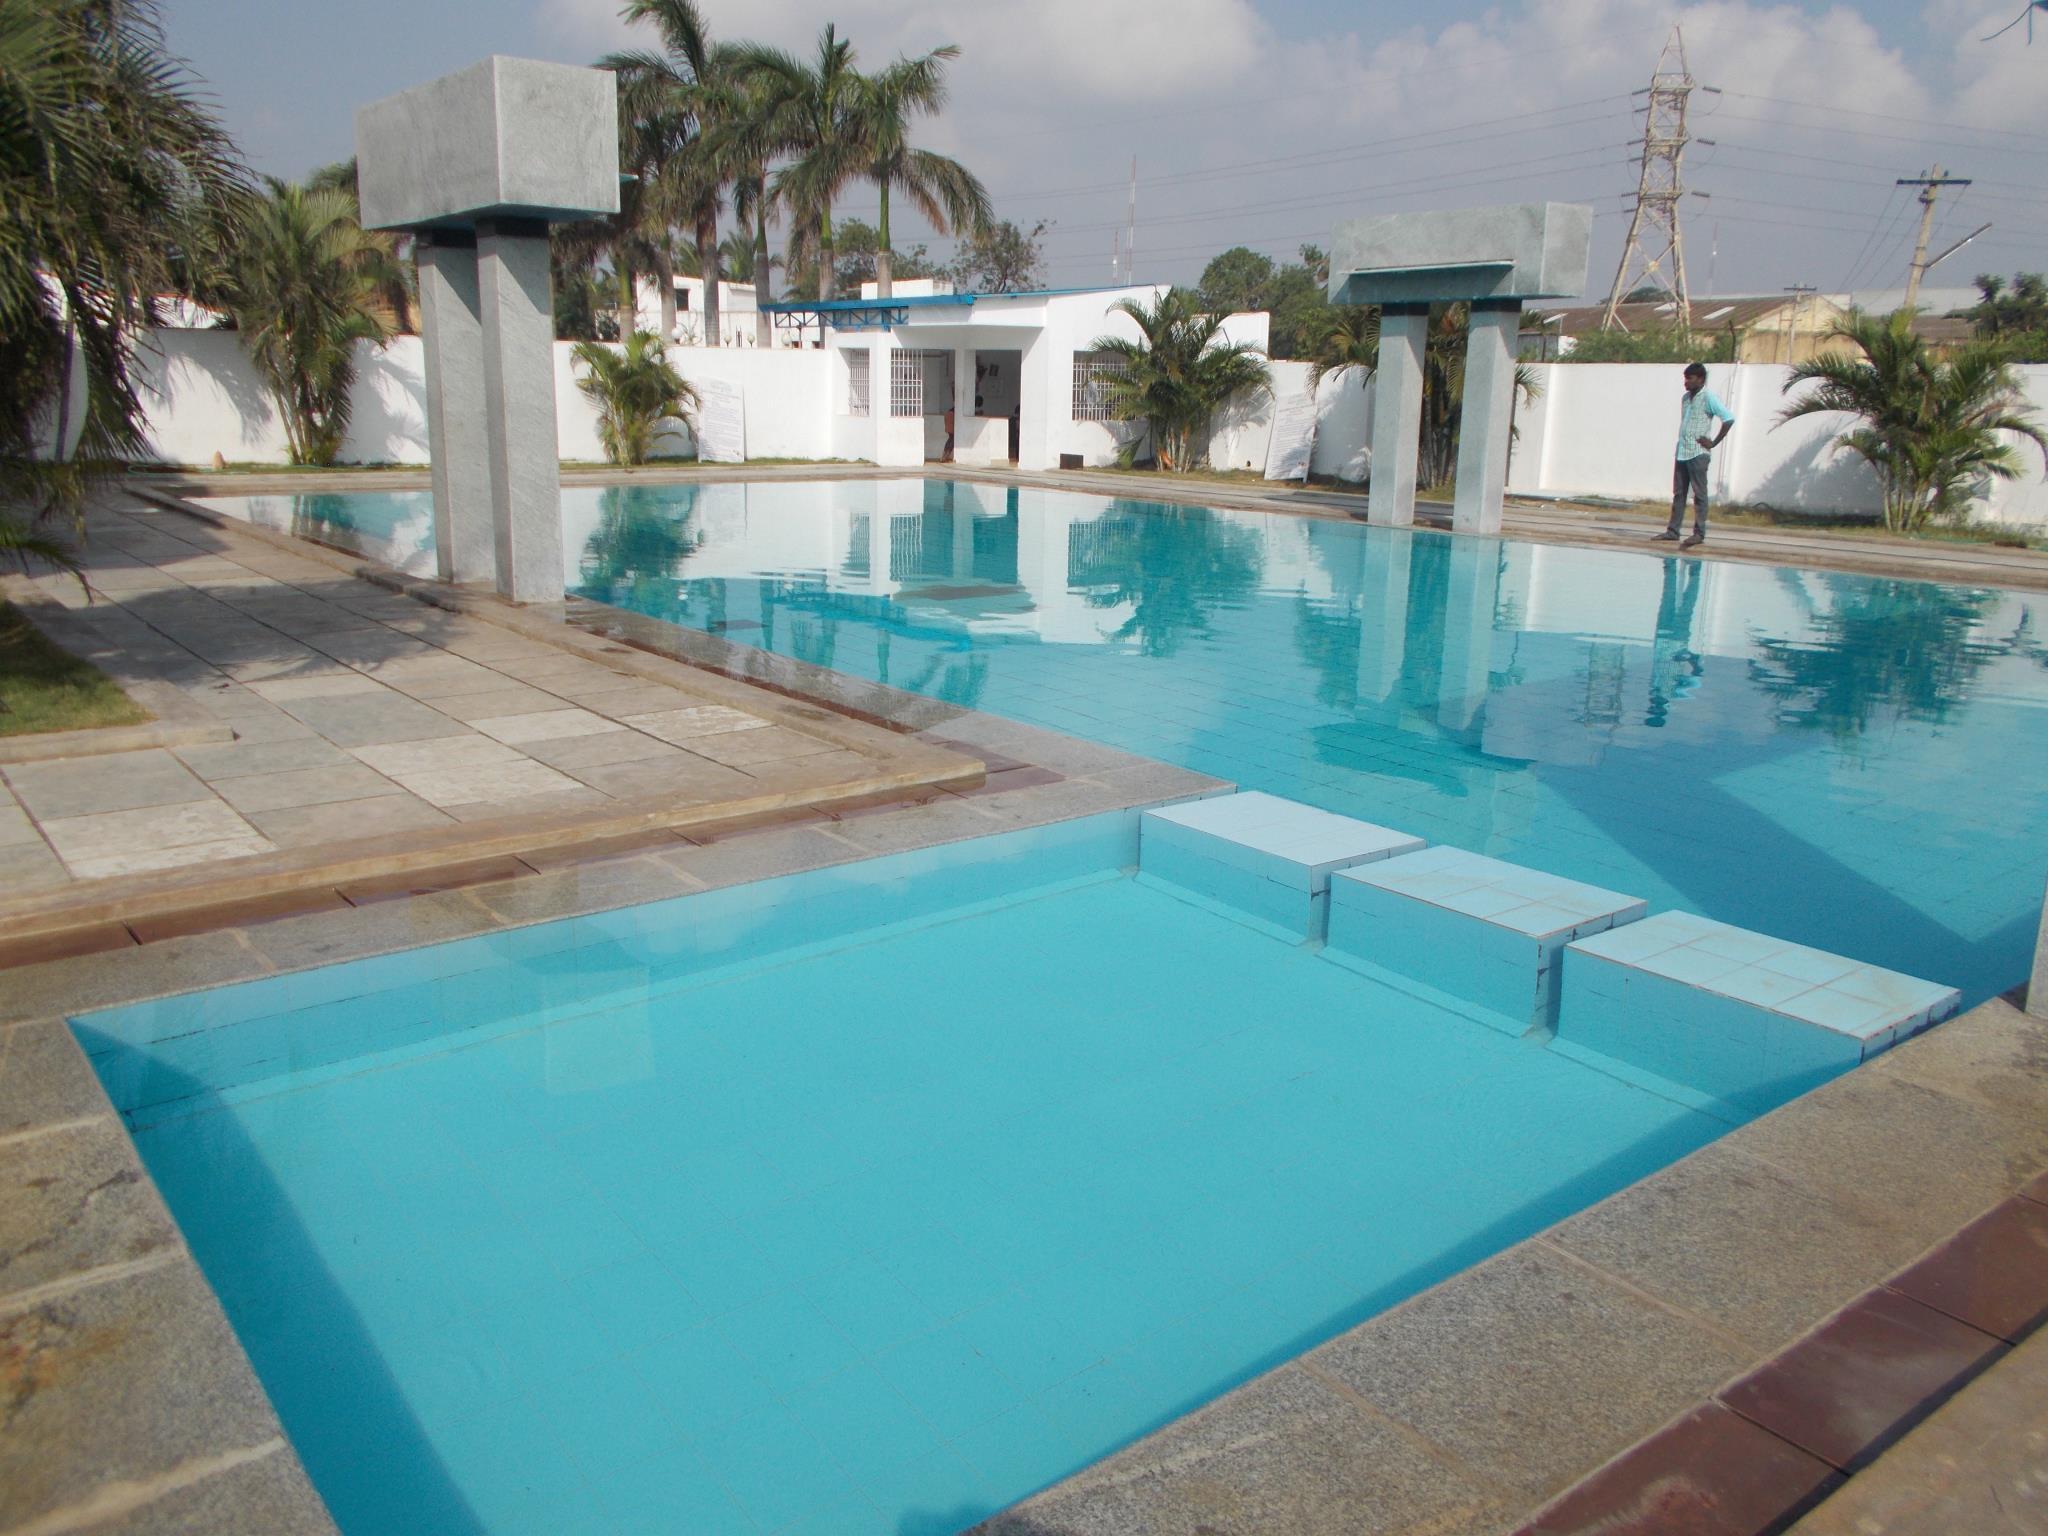 Aqua Green Hotel And Resort   Puzhal Lake